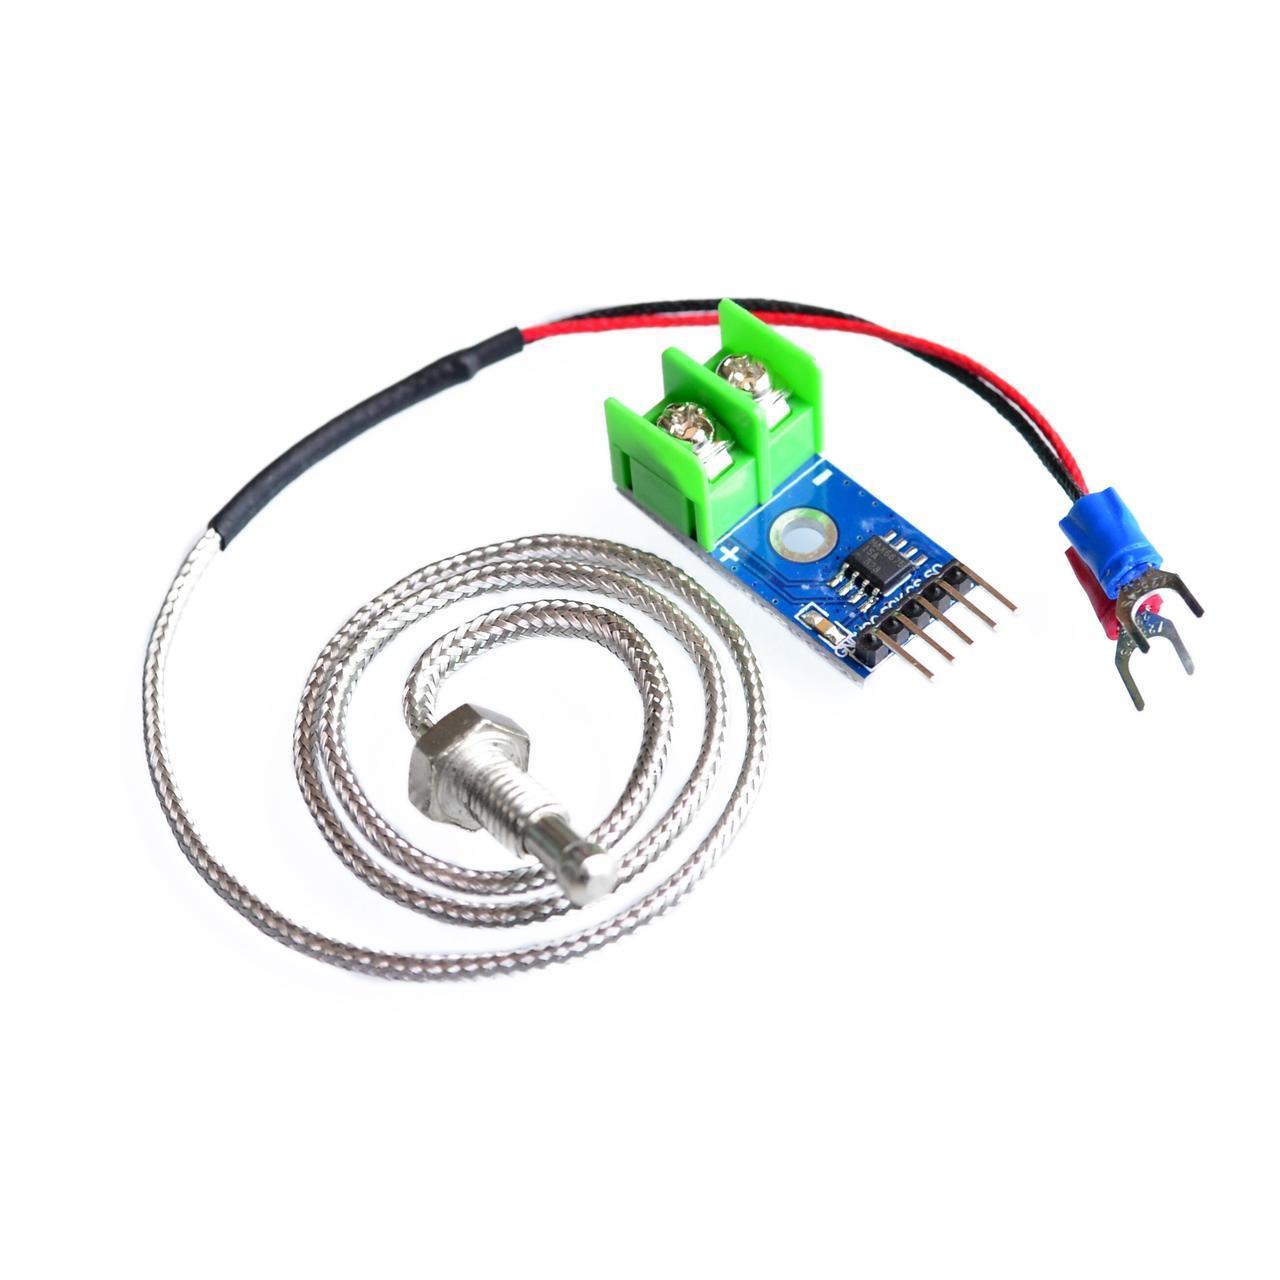 MAX6675 температурный сенсор 0-600℃ термопара K-типа